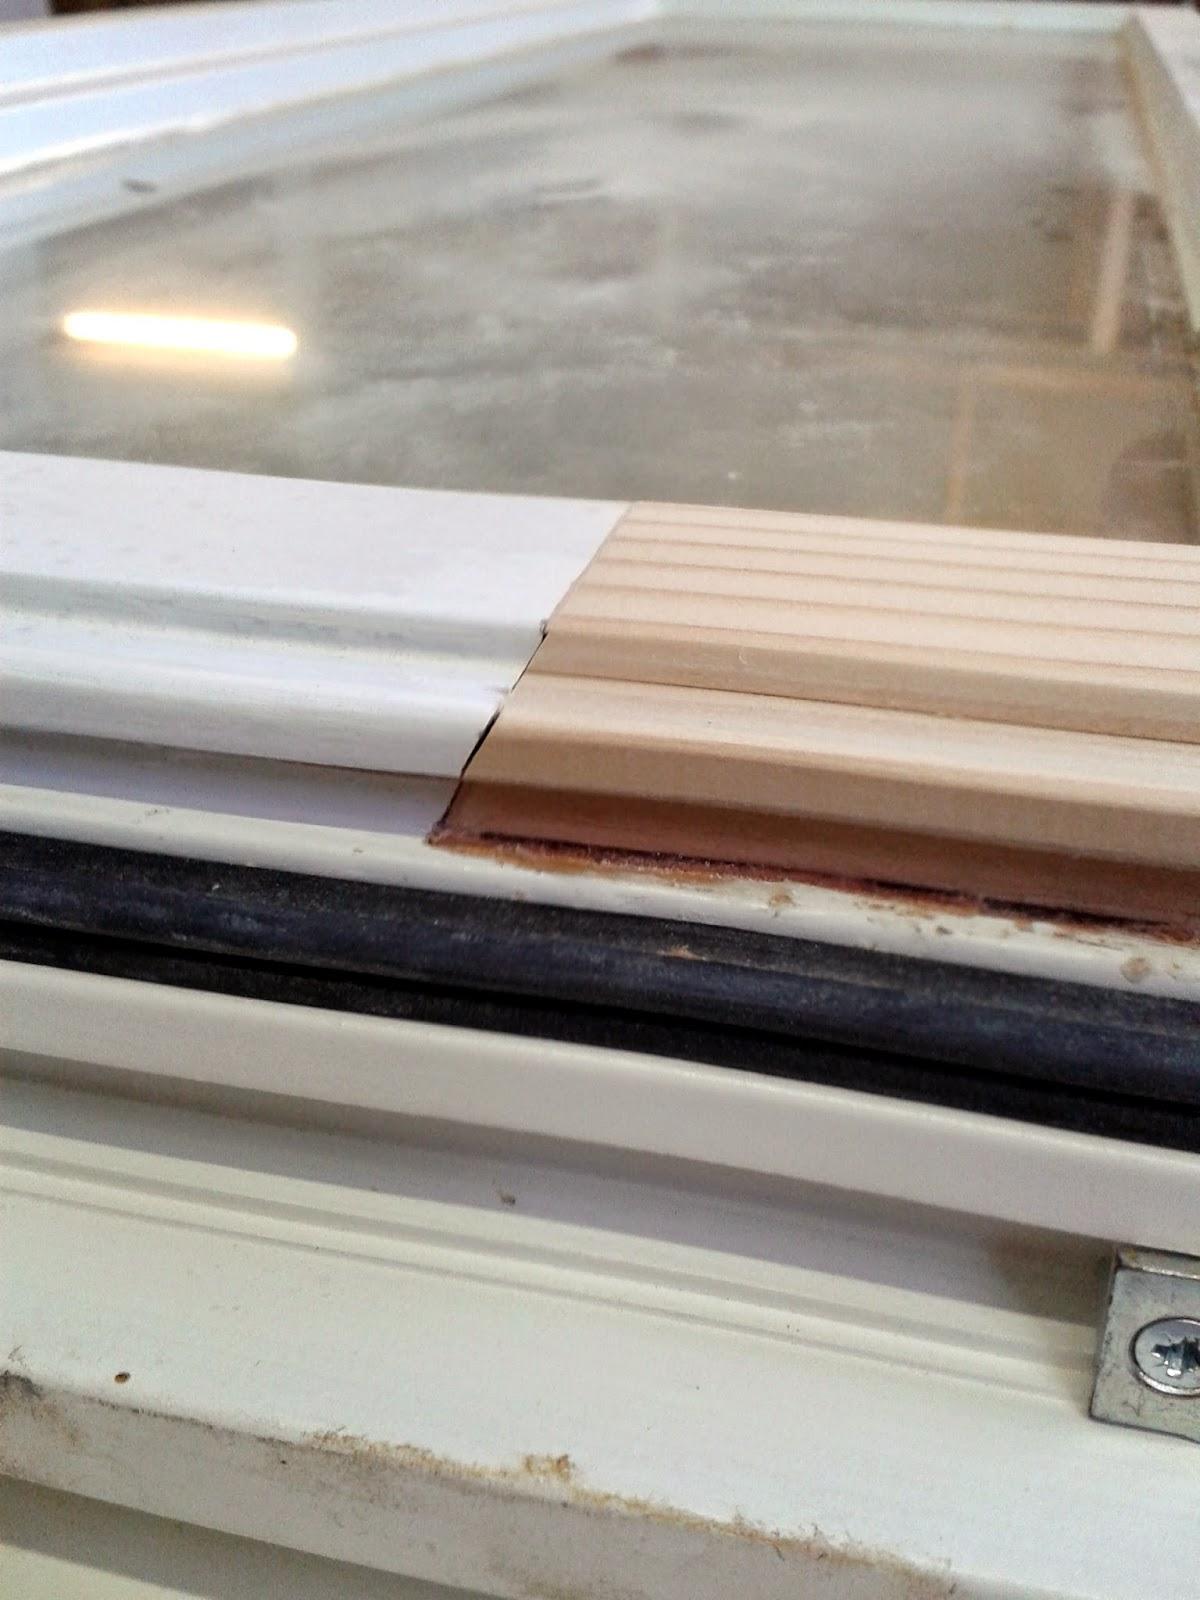 Top Selber machen!!: Morsche Holzfenster reparieren DJ77